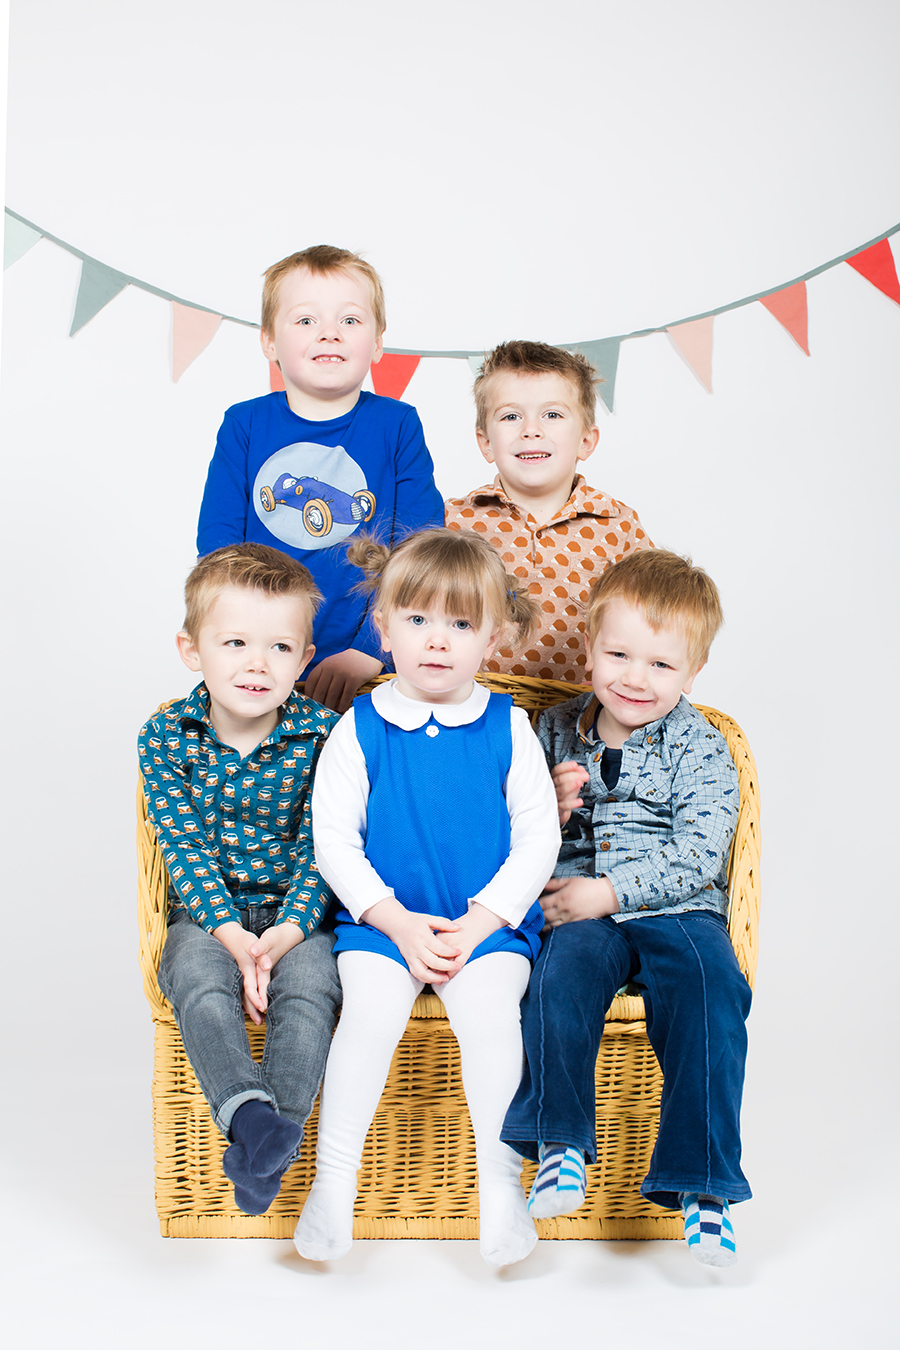 Familiefotografie in studio